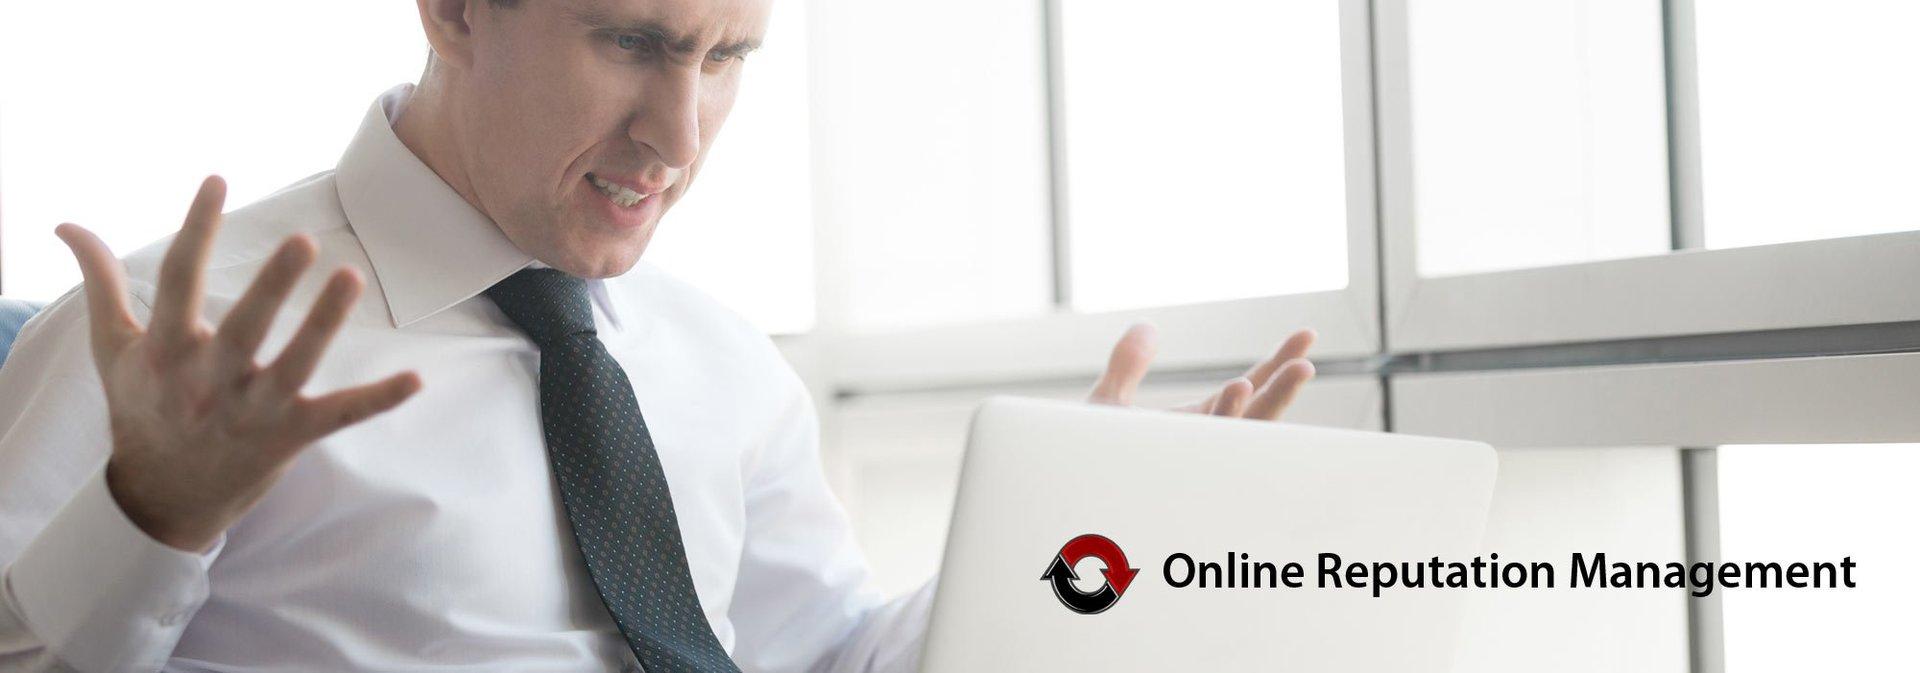 Online Reputation Management Services - Solution Web Designs